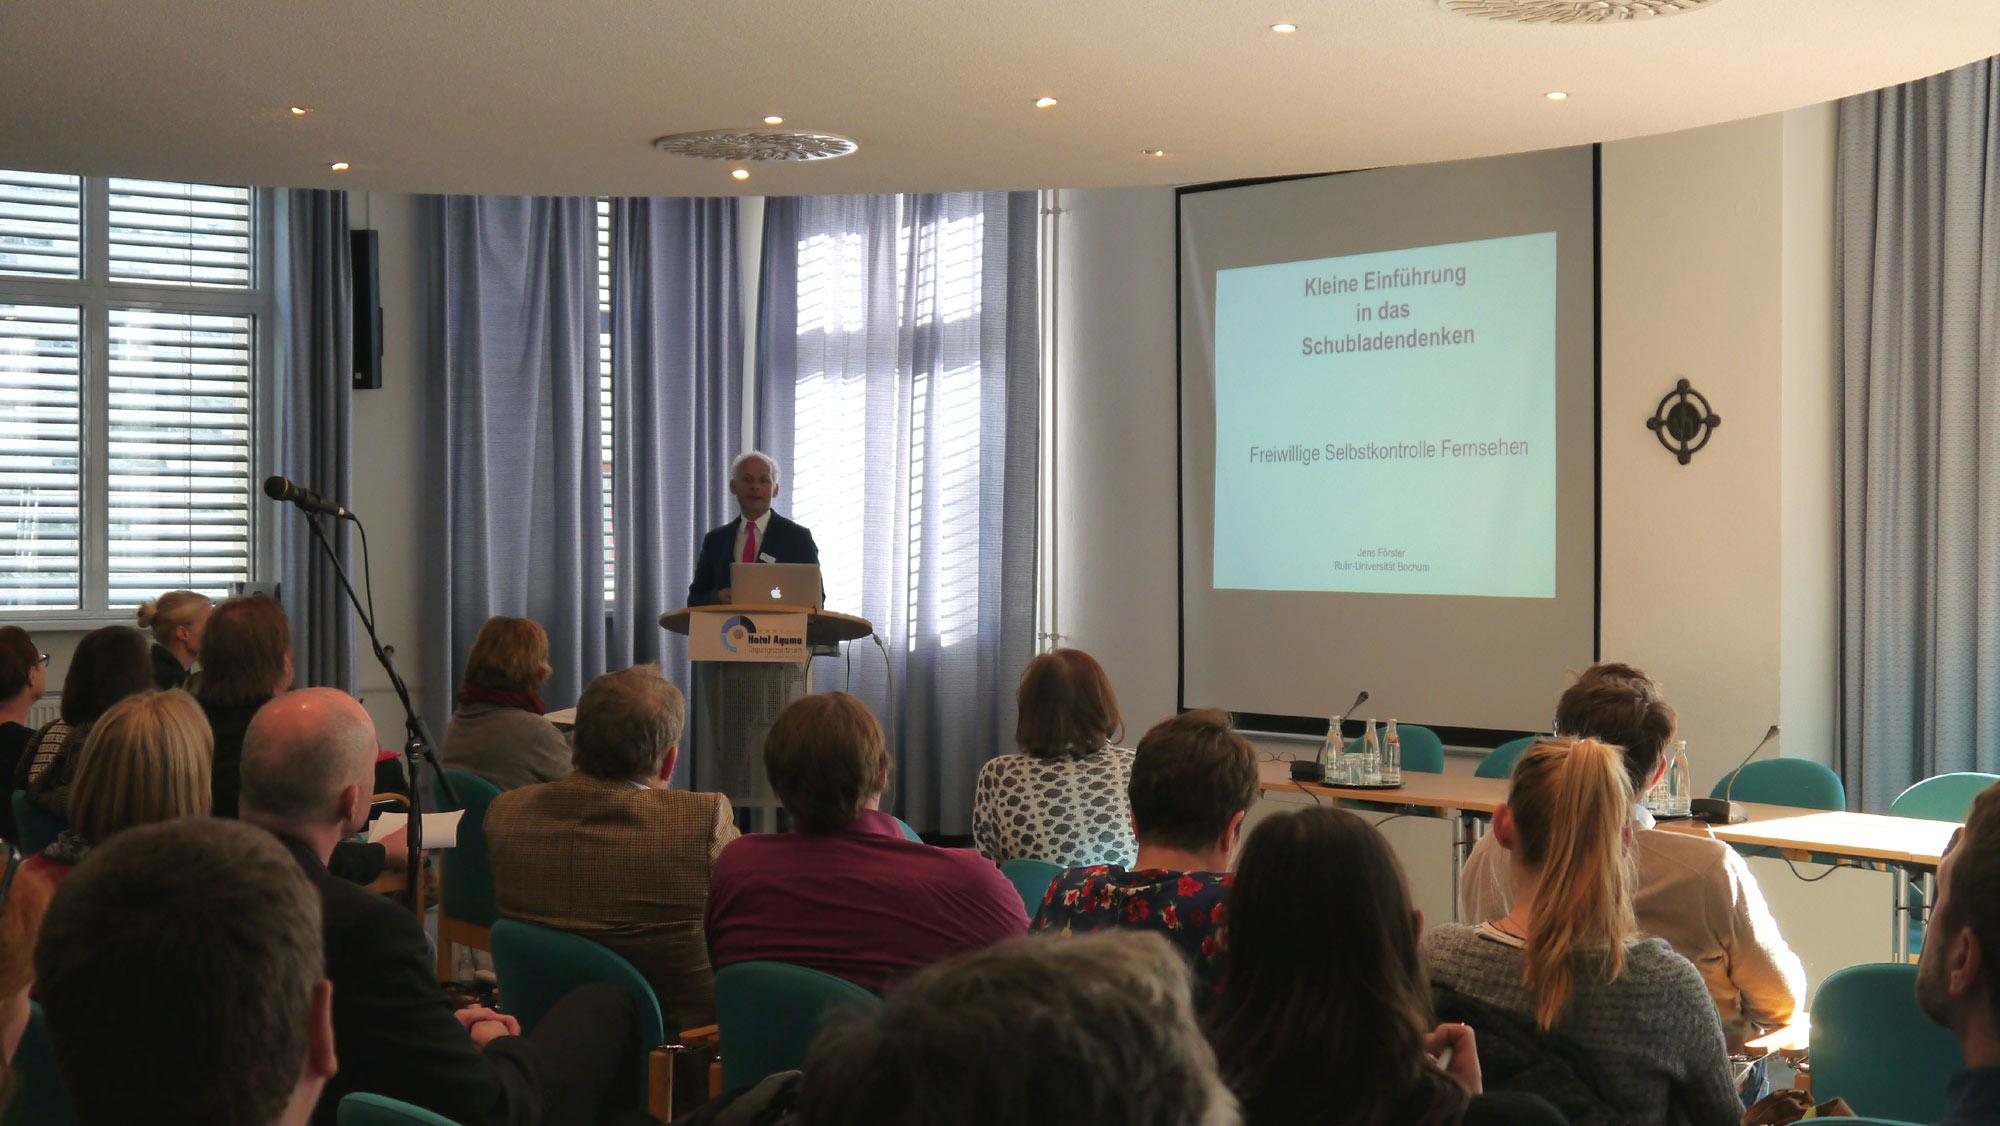 Klickvergrößernd: Referent Prof. Dr. Jens Förster (Ruhr-Universität Bochum) auf der FSF-Prüferfortbildung am 12. Oktober 2015 © FSF